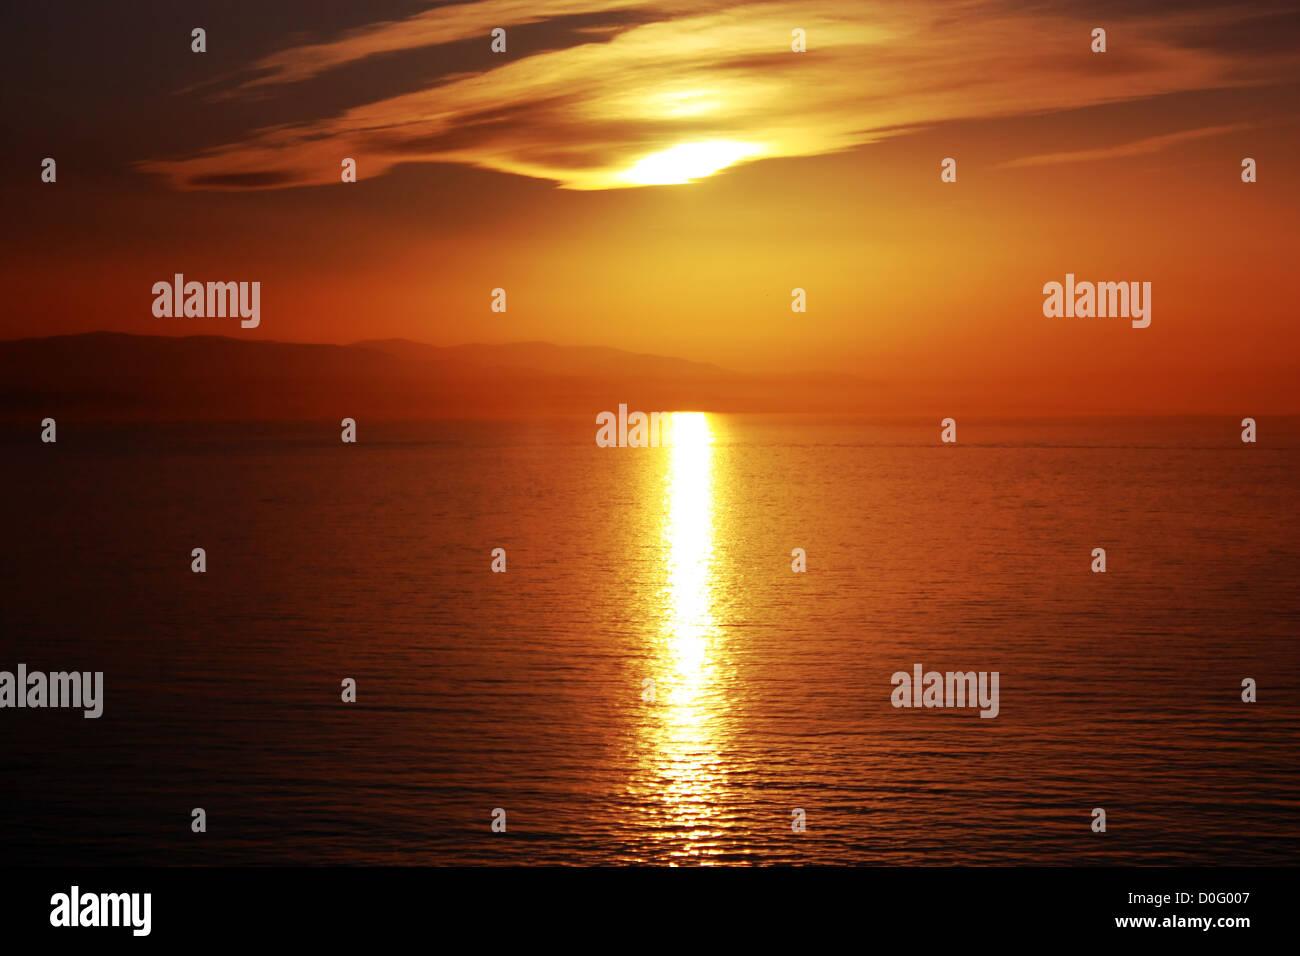 Seaside sunset scene in warm colors horizontal - Stock Image